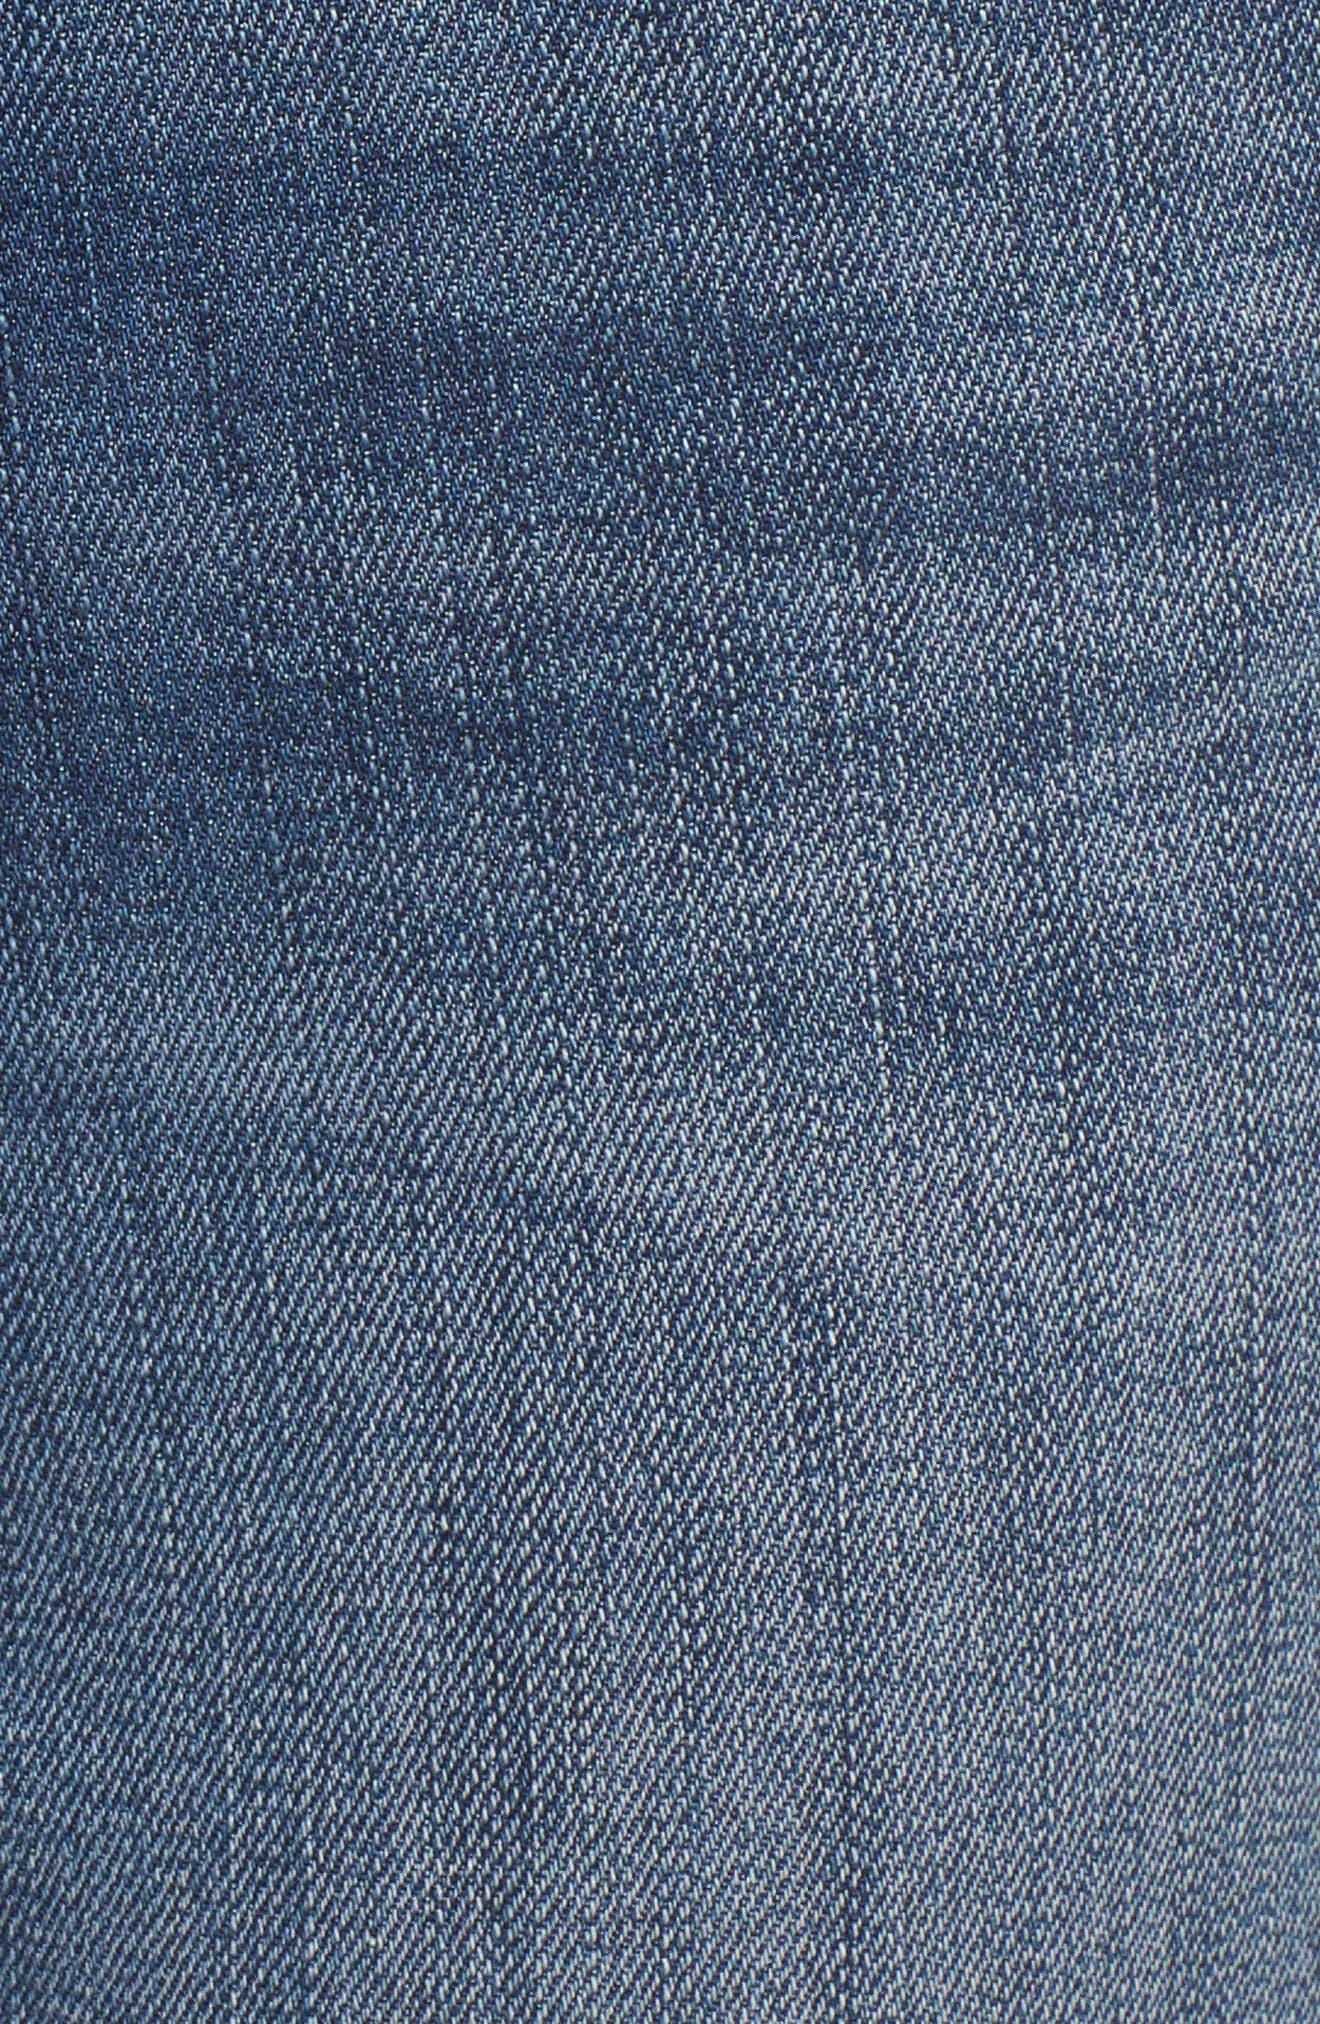 Charity High Waist Skinny Ankle Jeans,                             Alternate thumbnail 7, color,                             Rain Dusk Worn